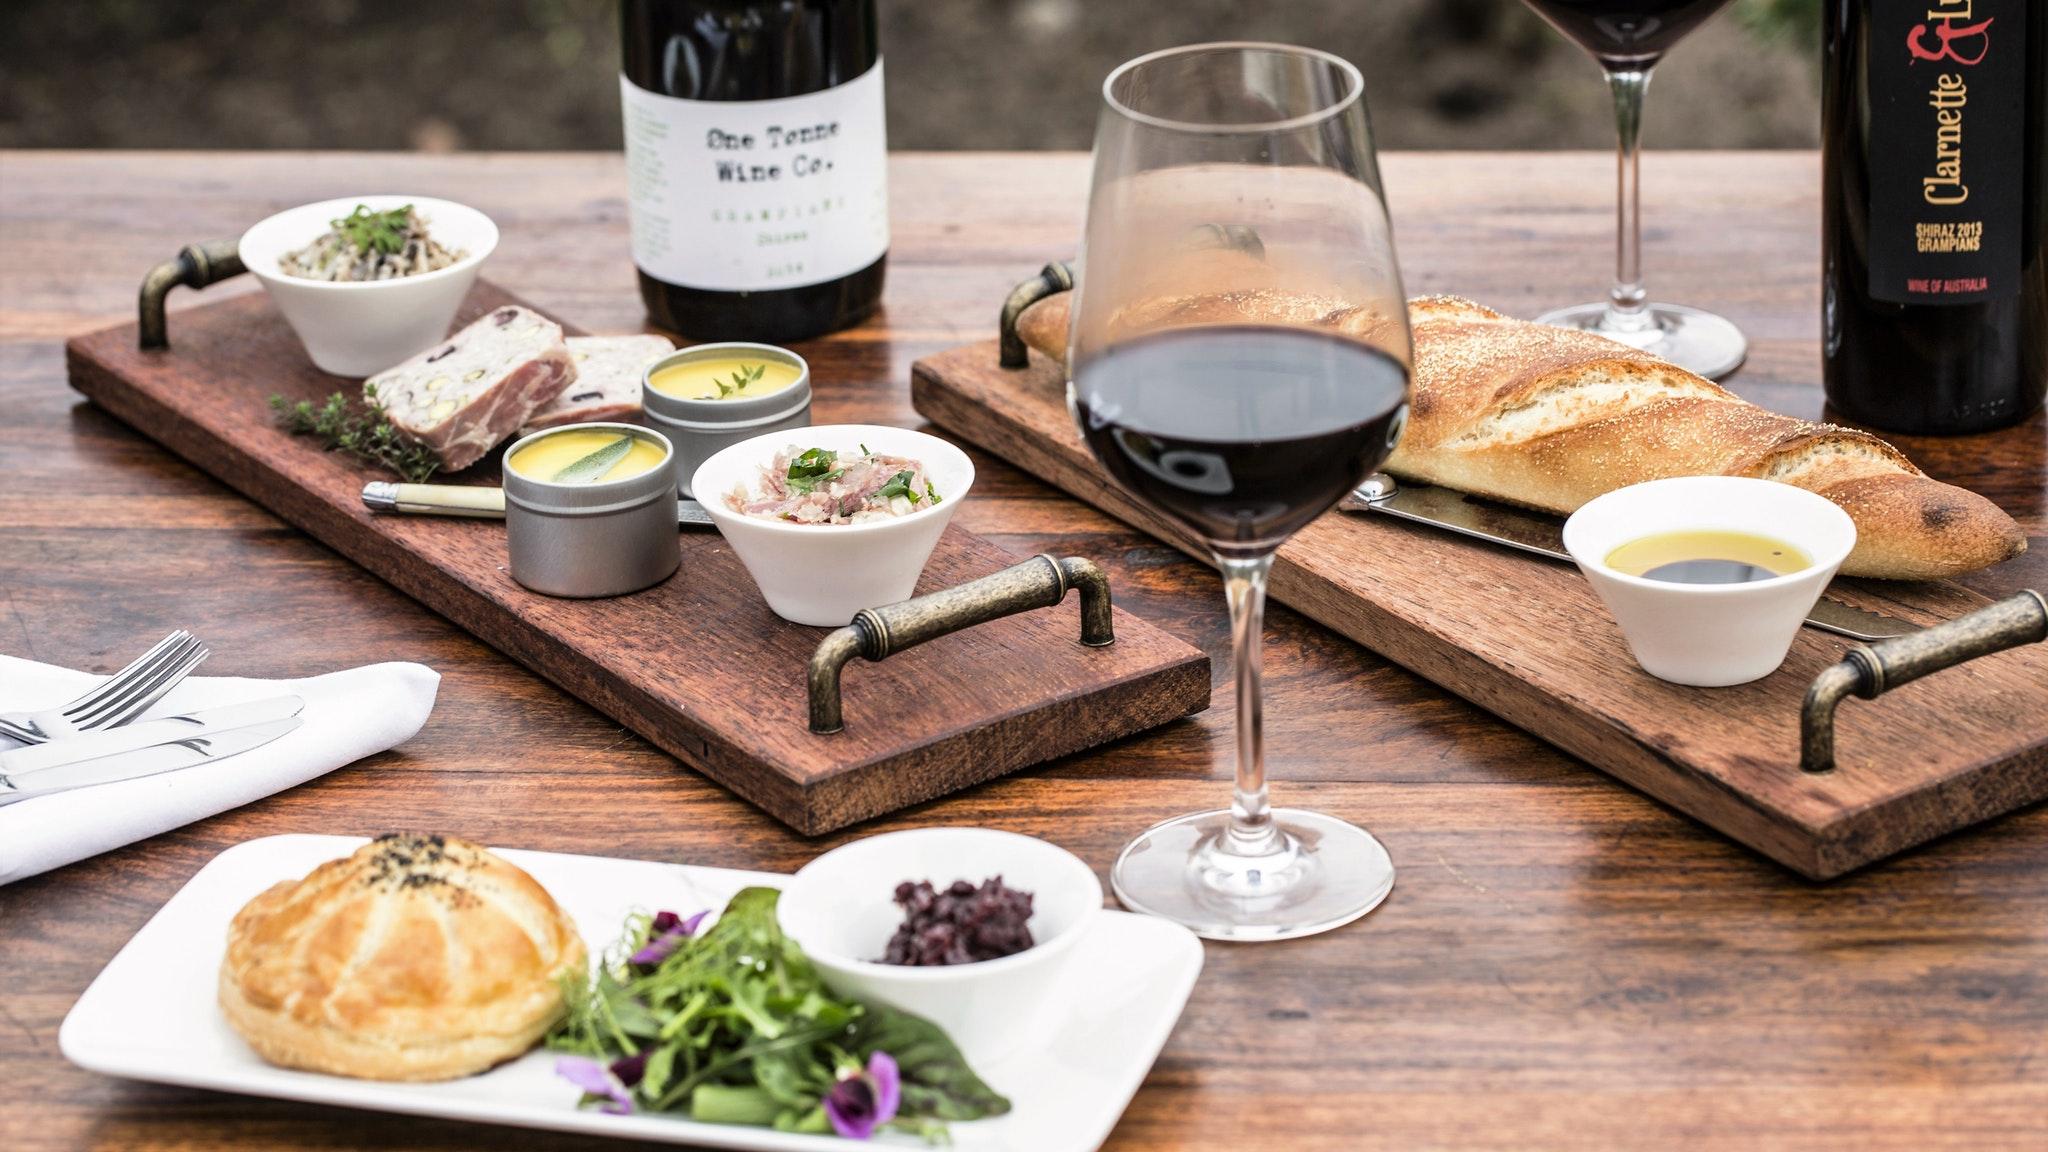 LIght lunches & Grampians Wine